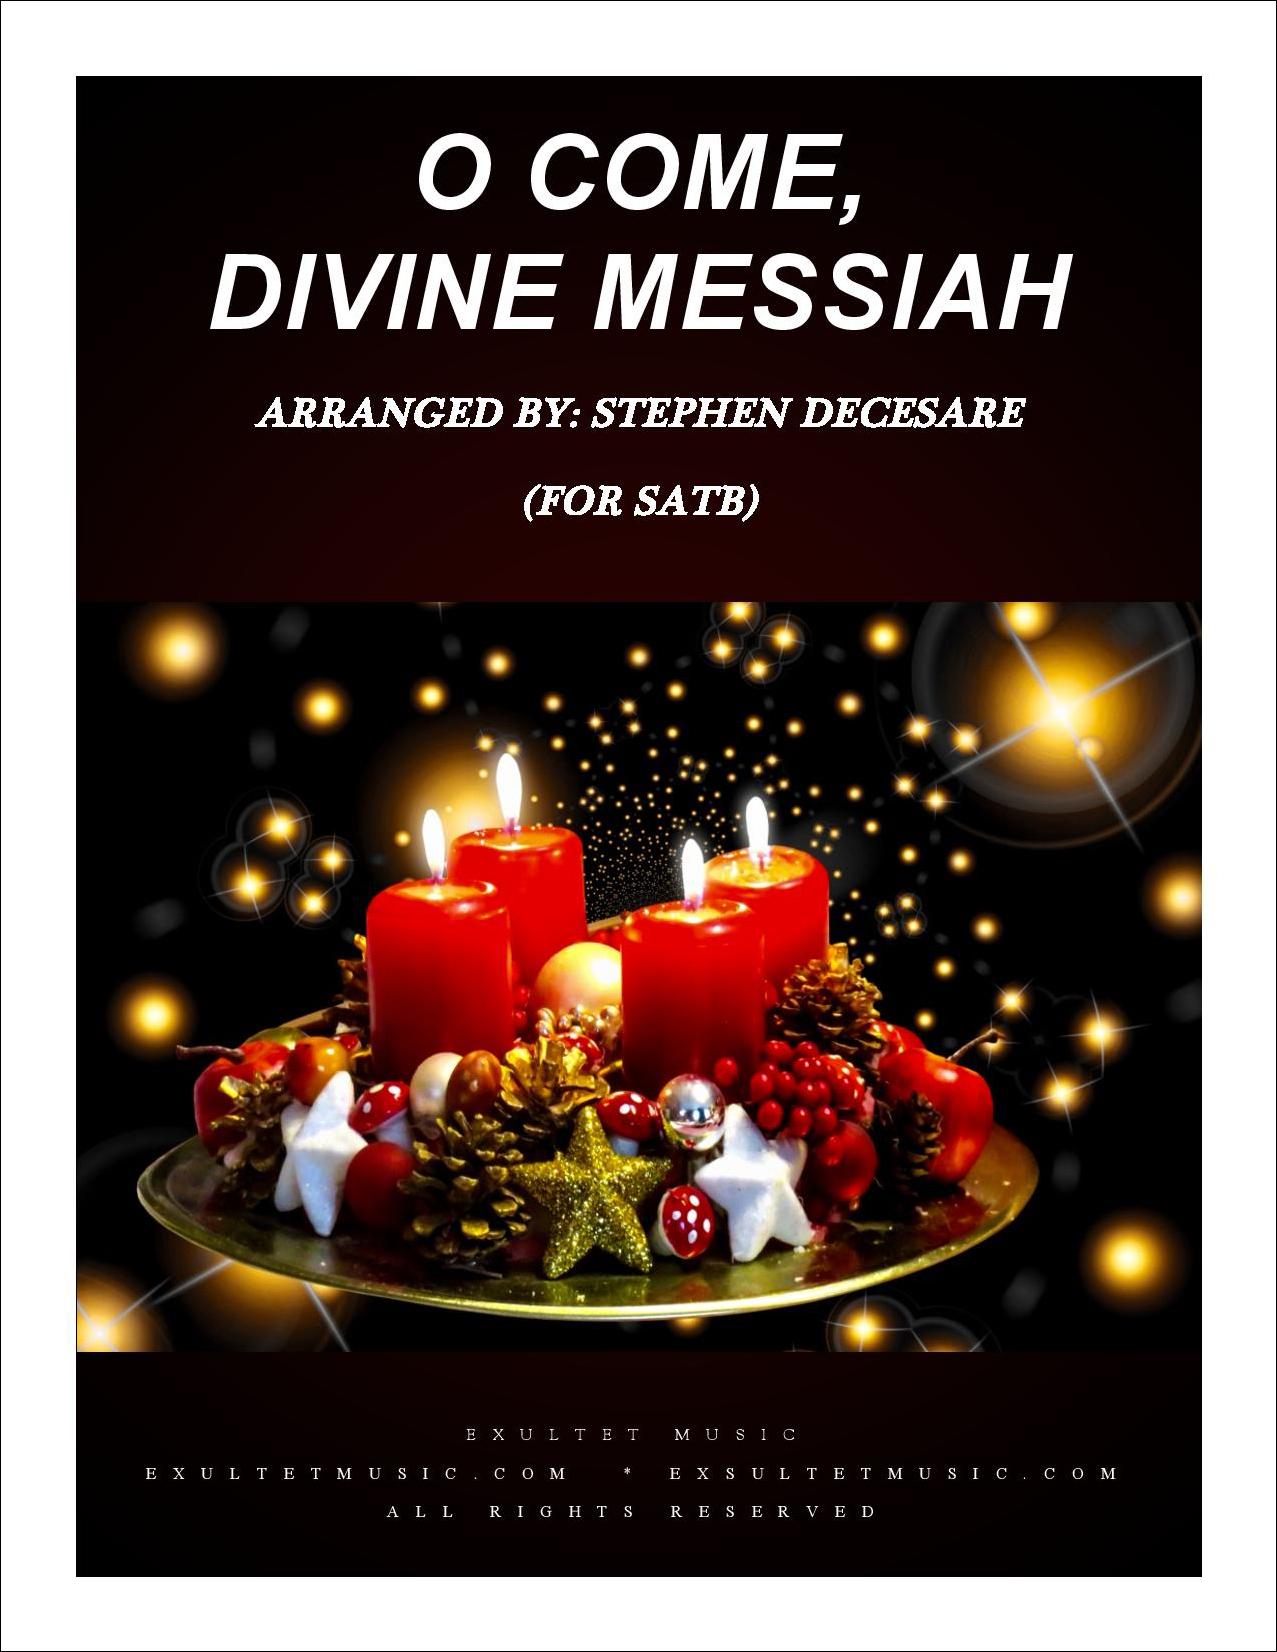 O Come, Divine Messiah